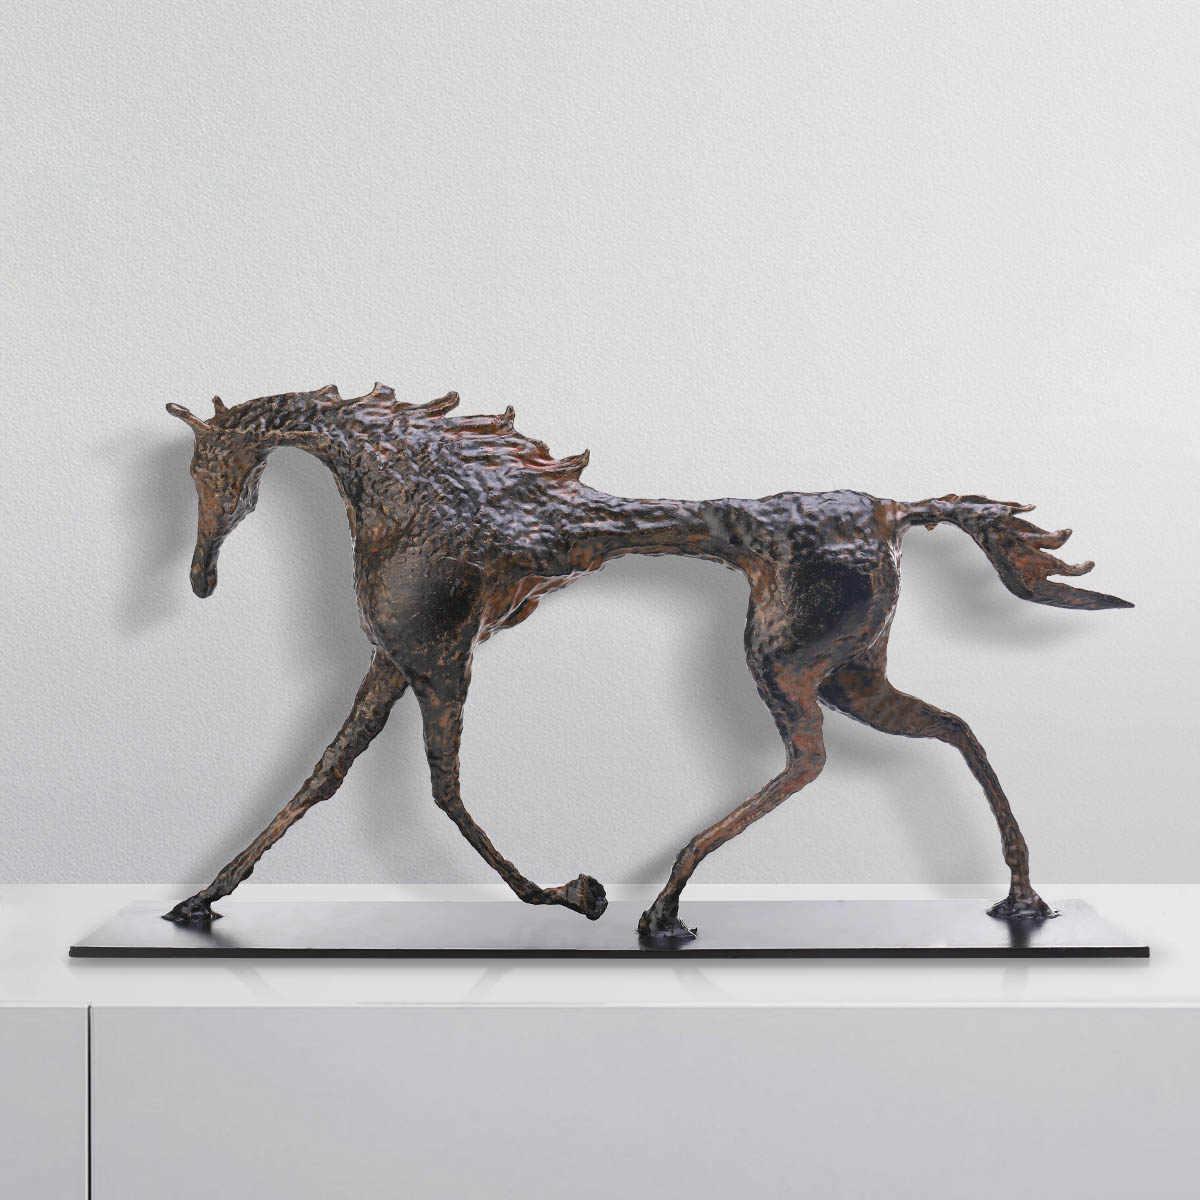 Art Decor Tribute Iron Casting Horse Sculpture Exquisite Handcraft Art Decor For Home Office Modern Art Figurine Festival Gift Statues Sculptures Aliexpress